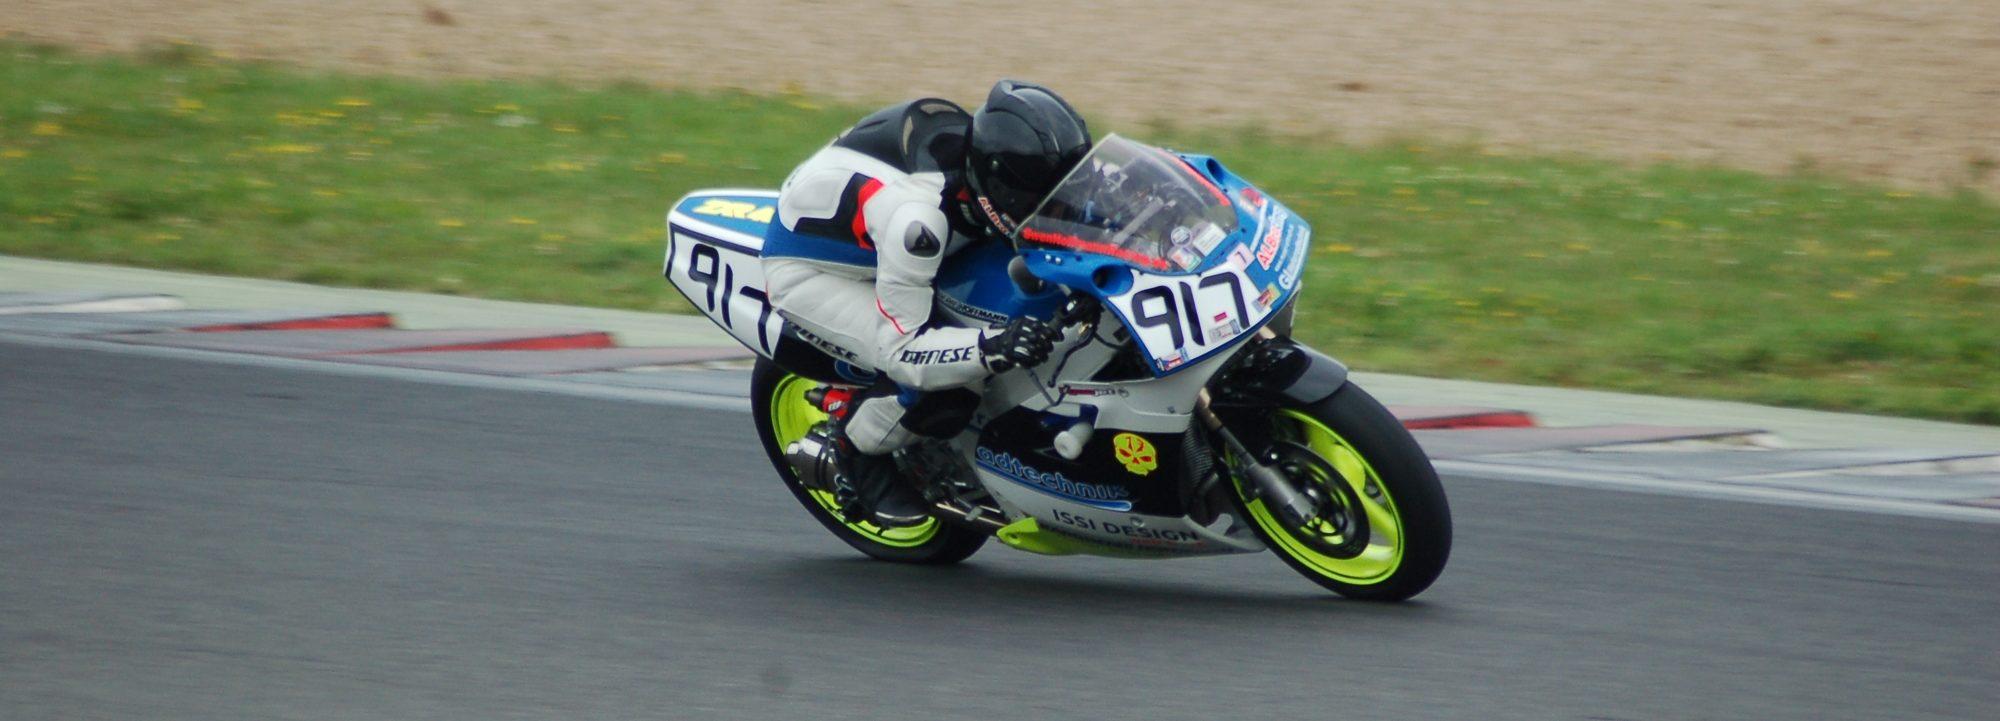 Swen Hoffmann Racing